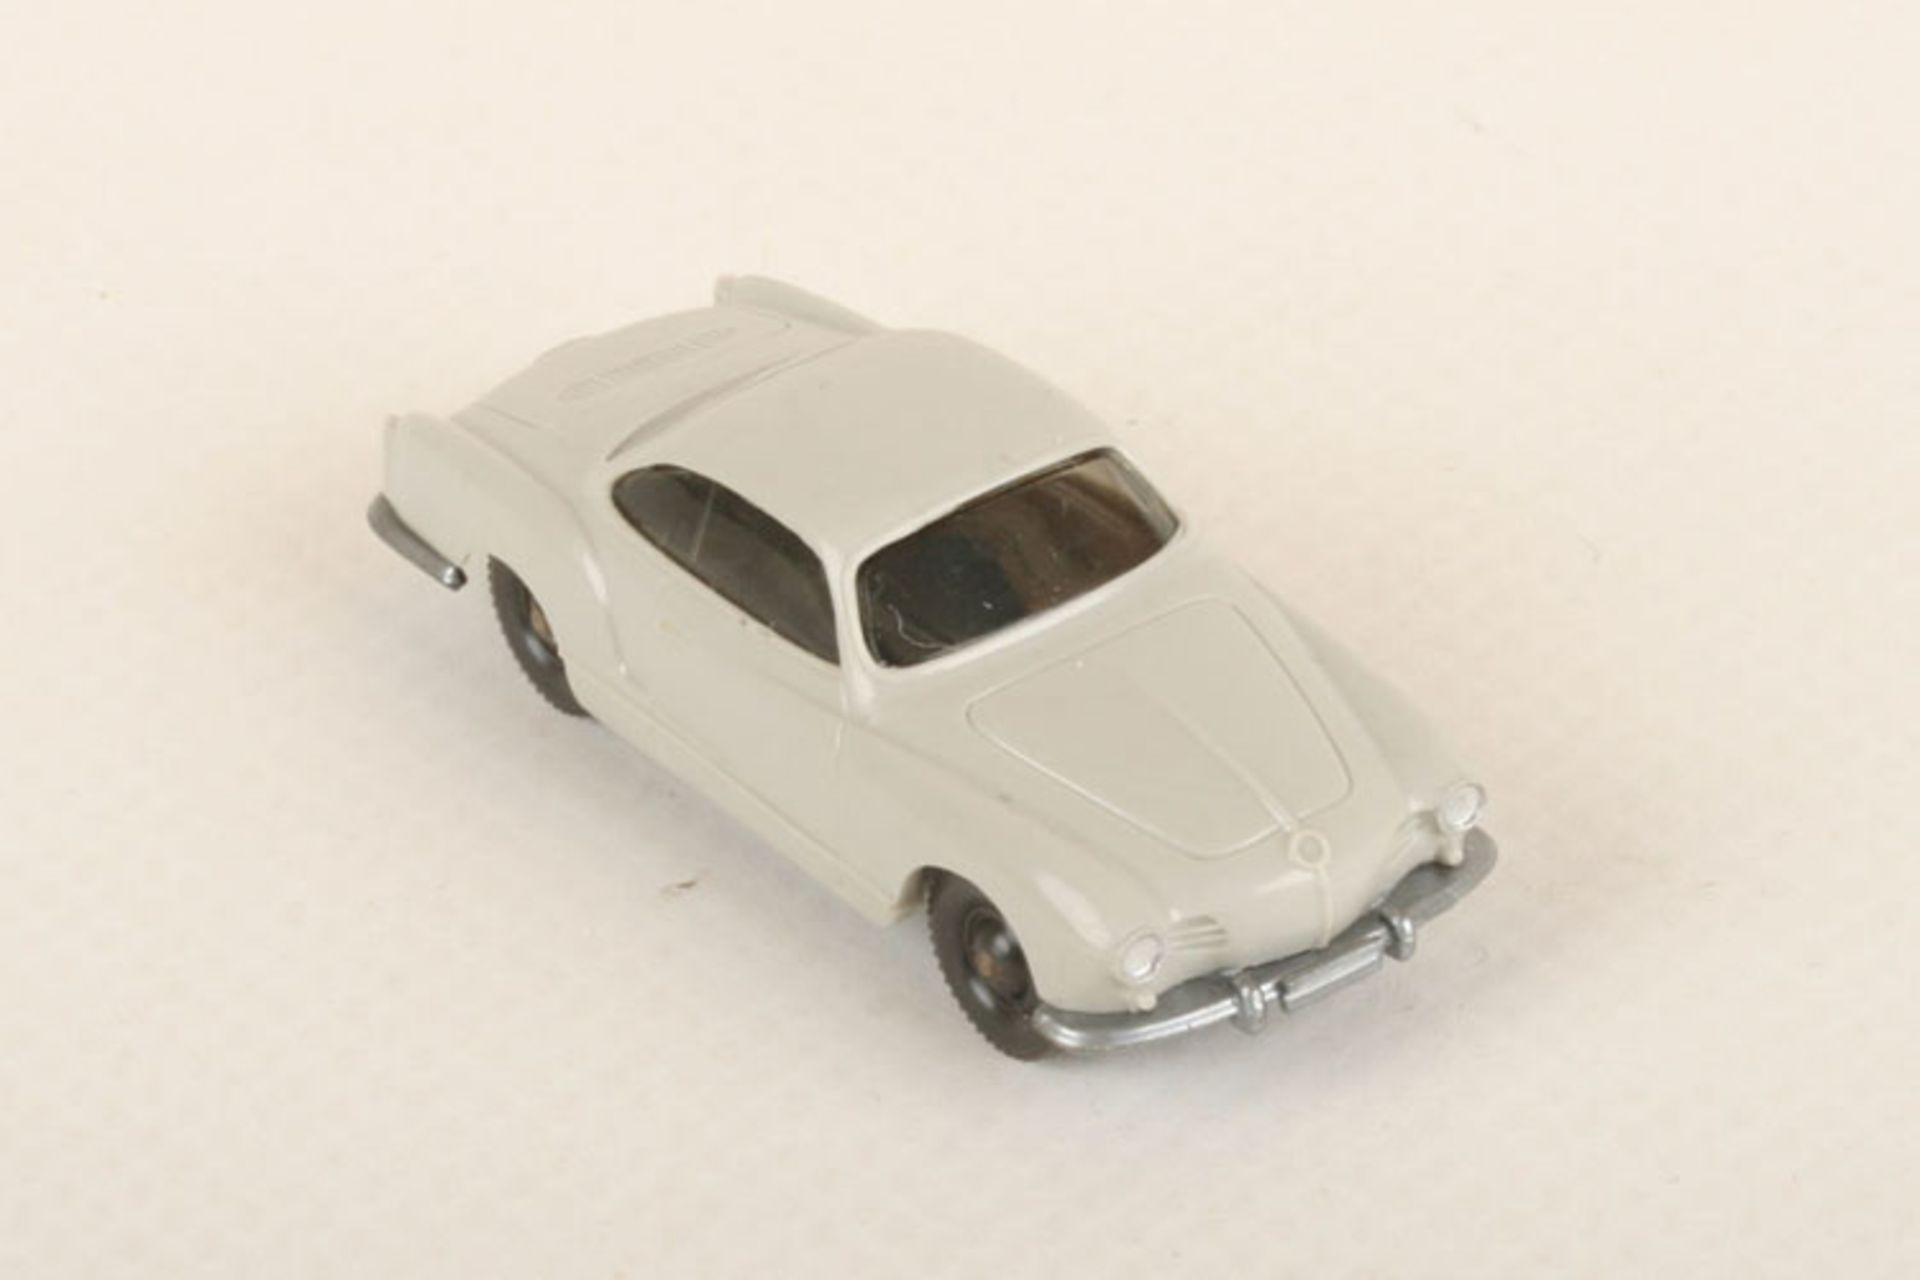 Los 1030 - Wiking VW Karmann achatgrau 34/5a, neuwertig